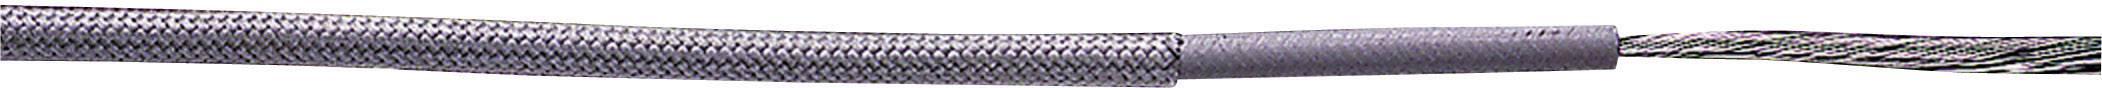 Vysokoteplotný drôt LappKabel 0065104 ÖLFLEX® HEAT 180 SIF, 1 x 1 mm², vonkajší Ø 3 mm, metrový tovar, priehľadná